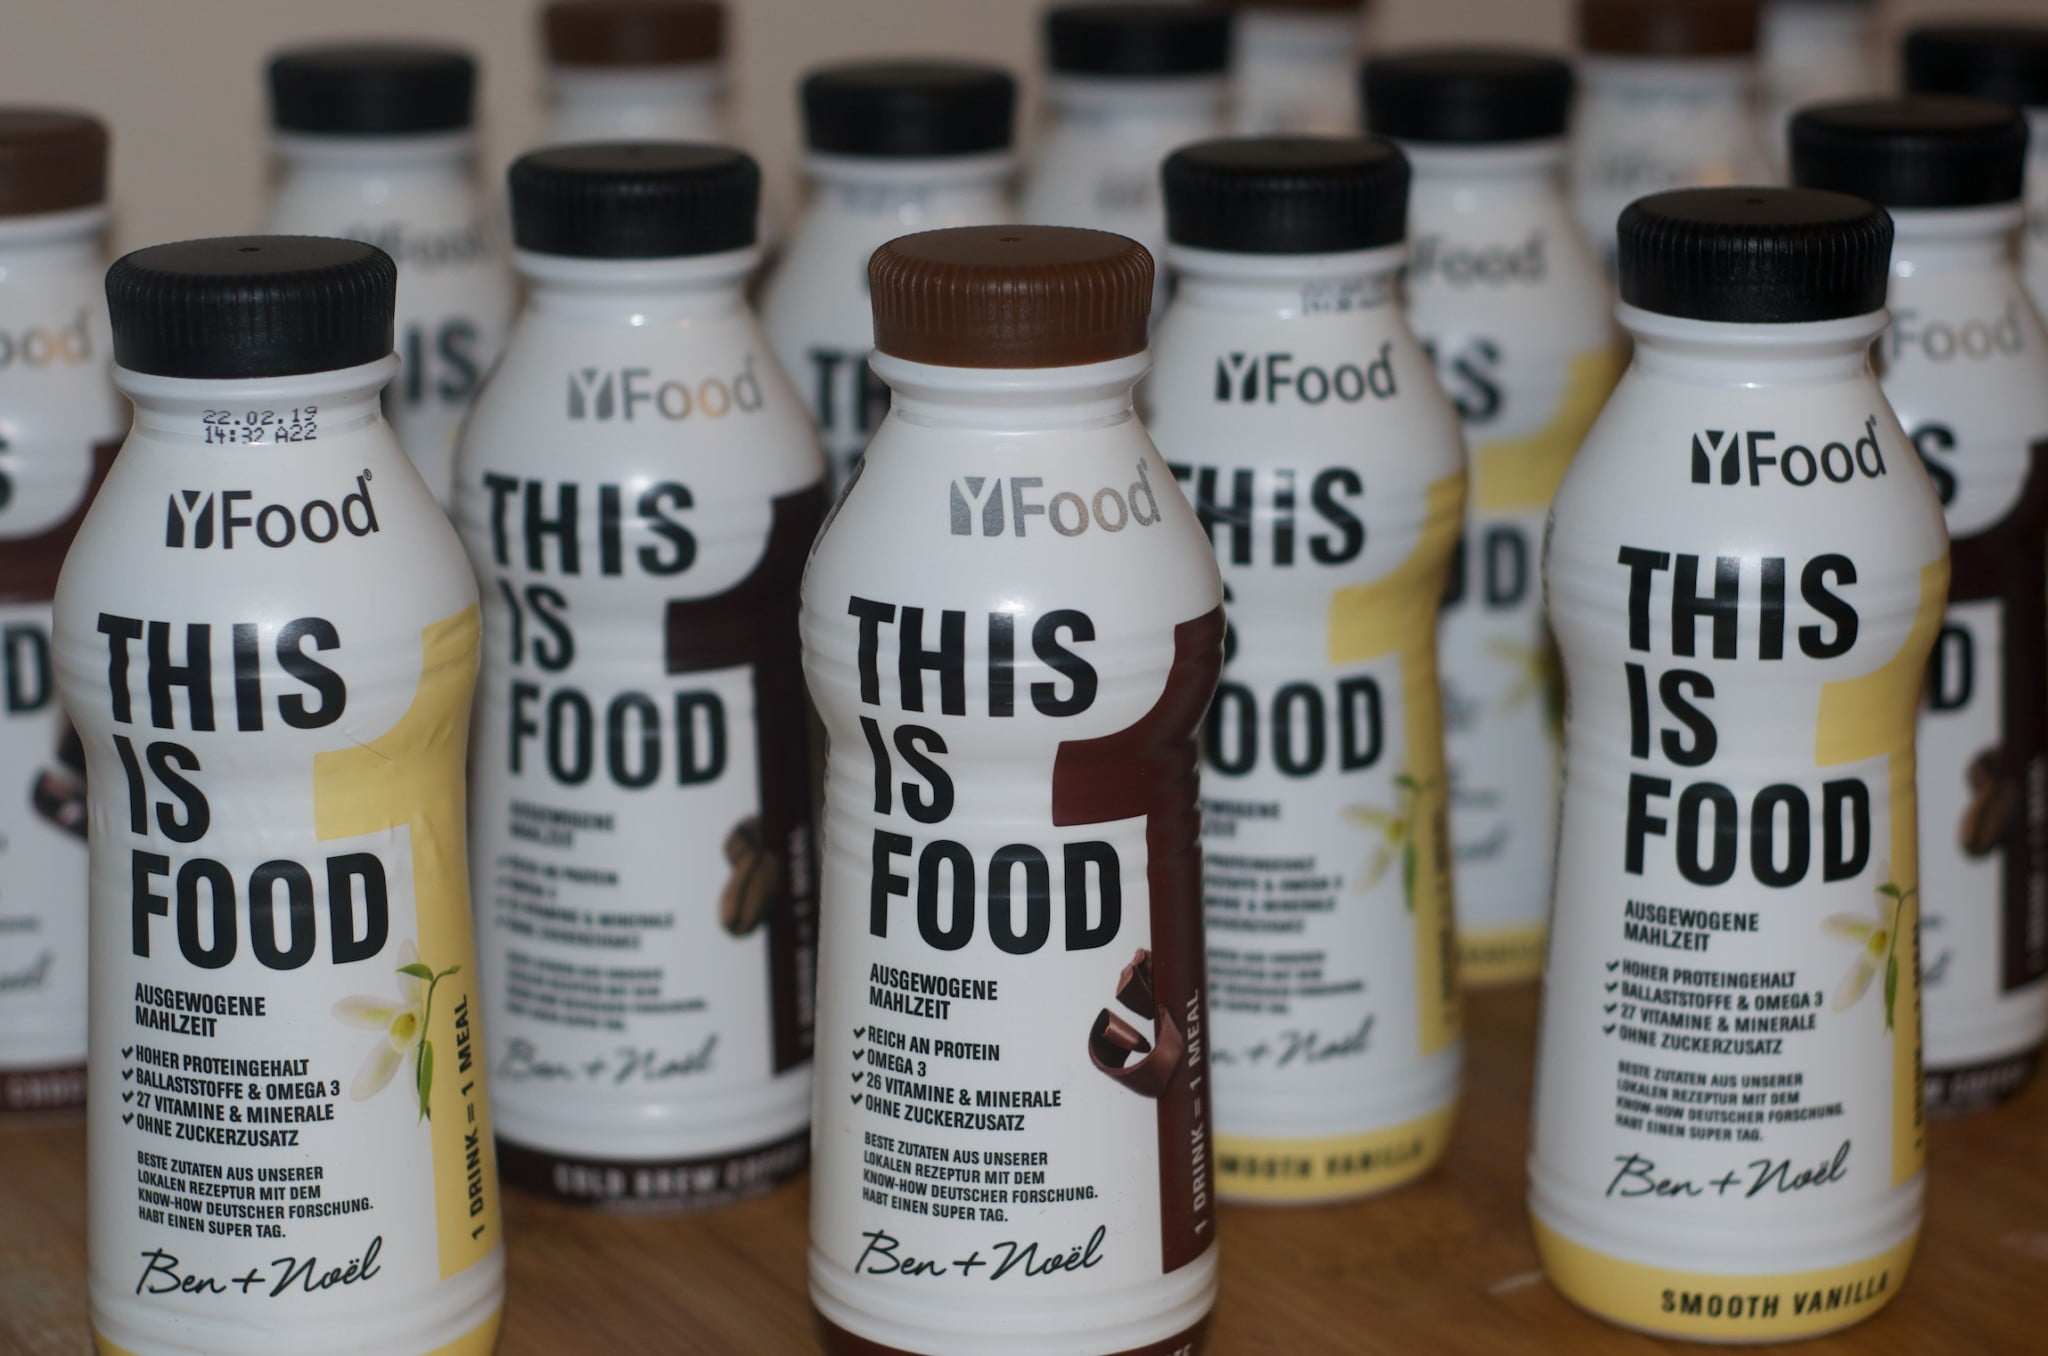 Is YFood the best tasting Complete Food?